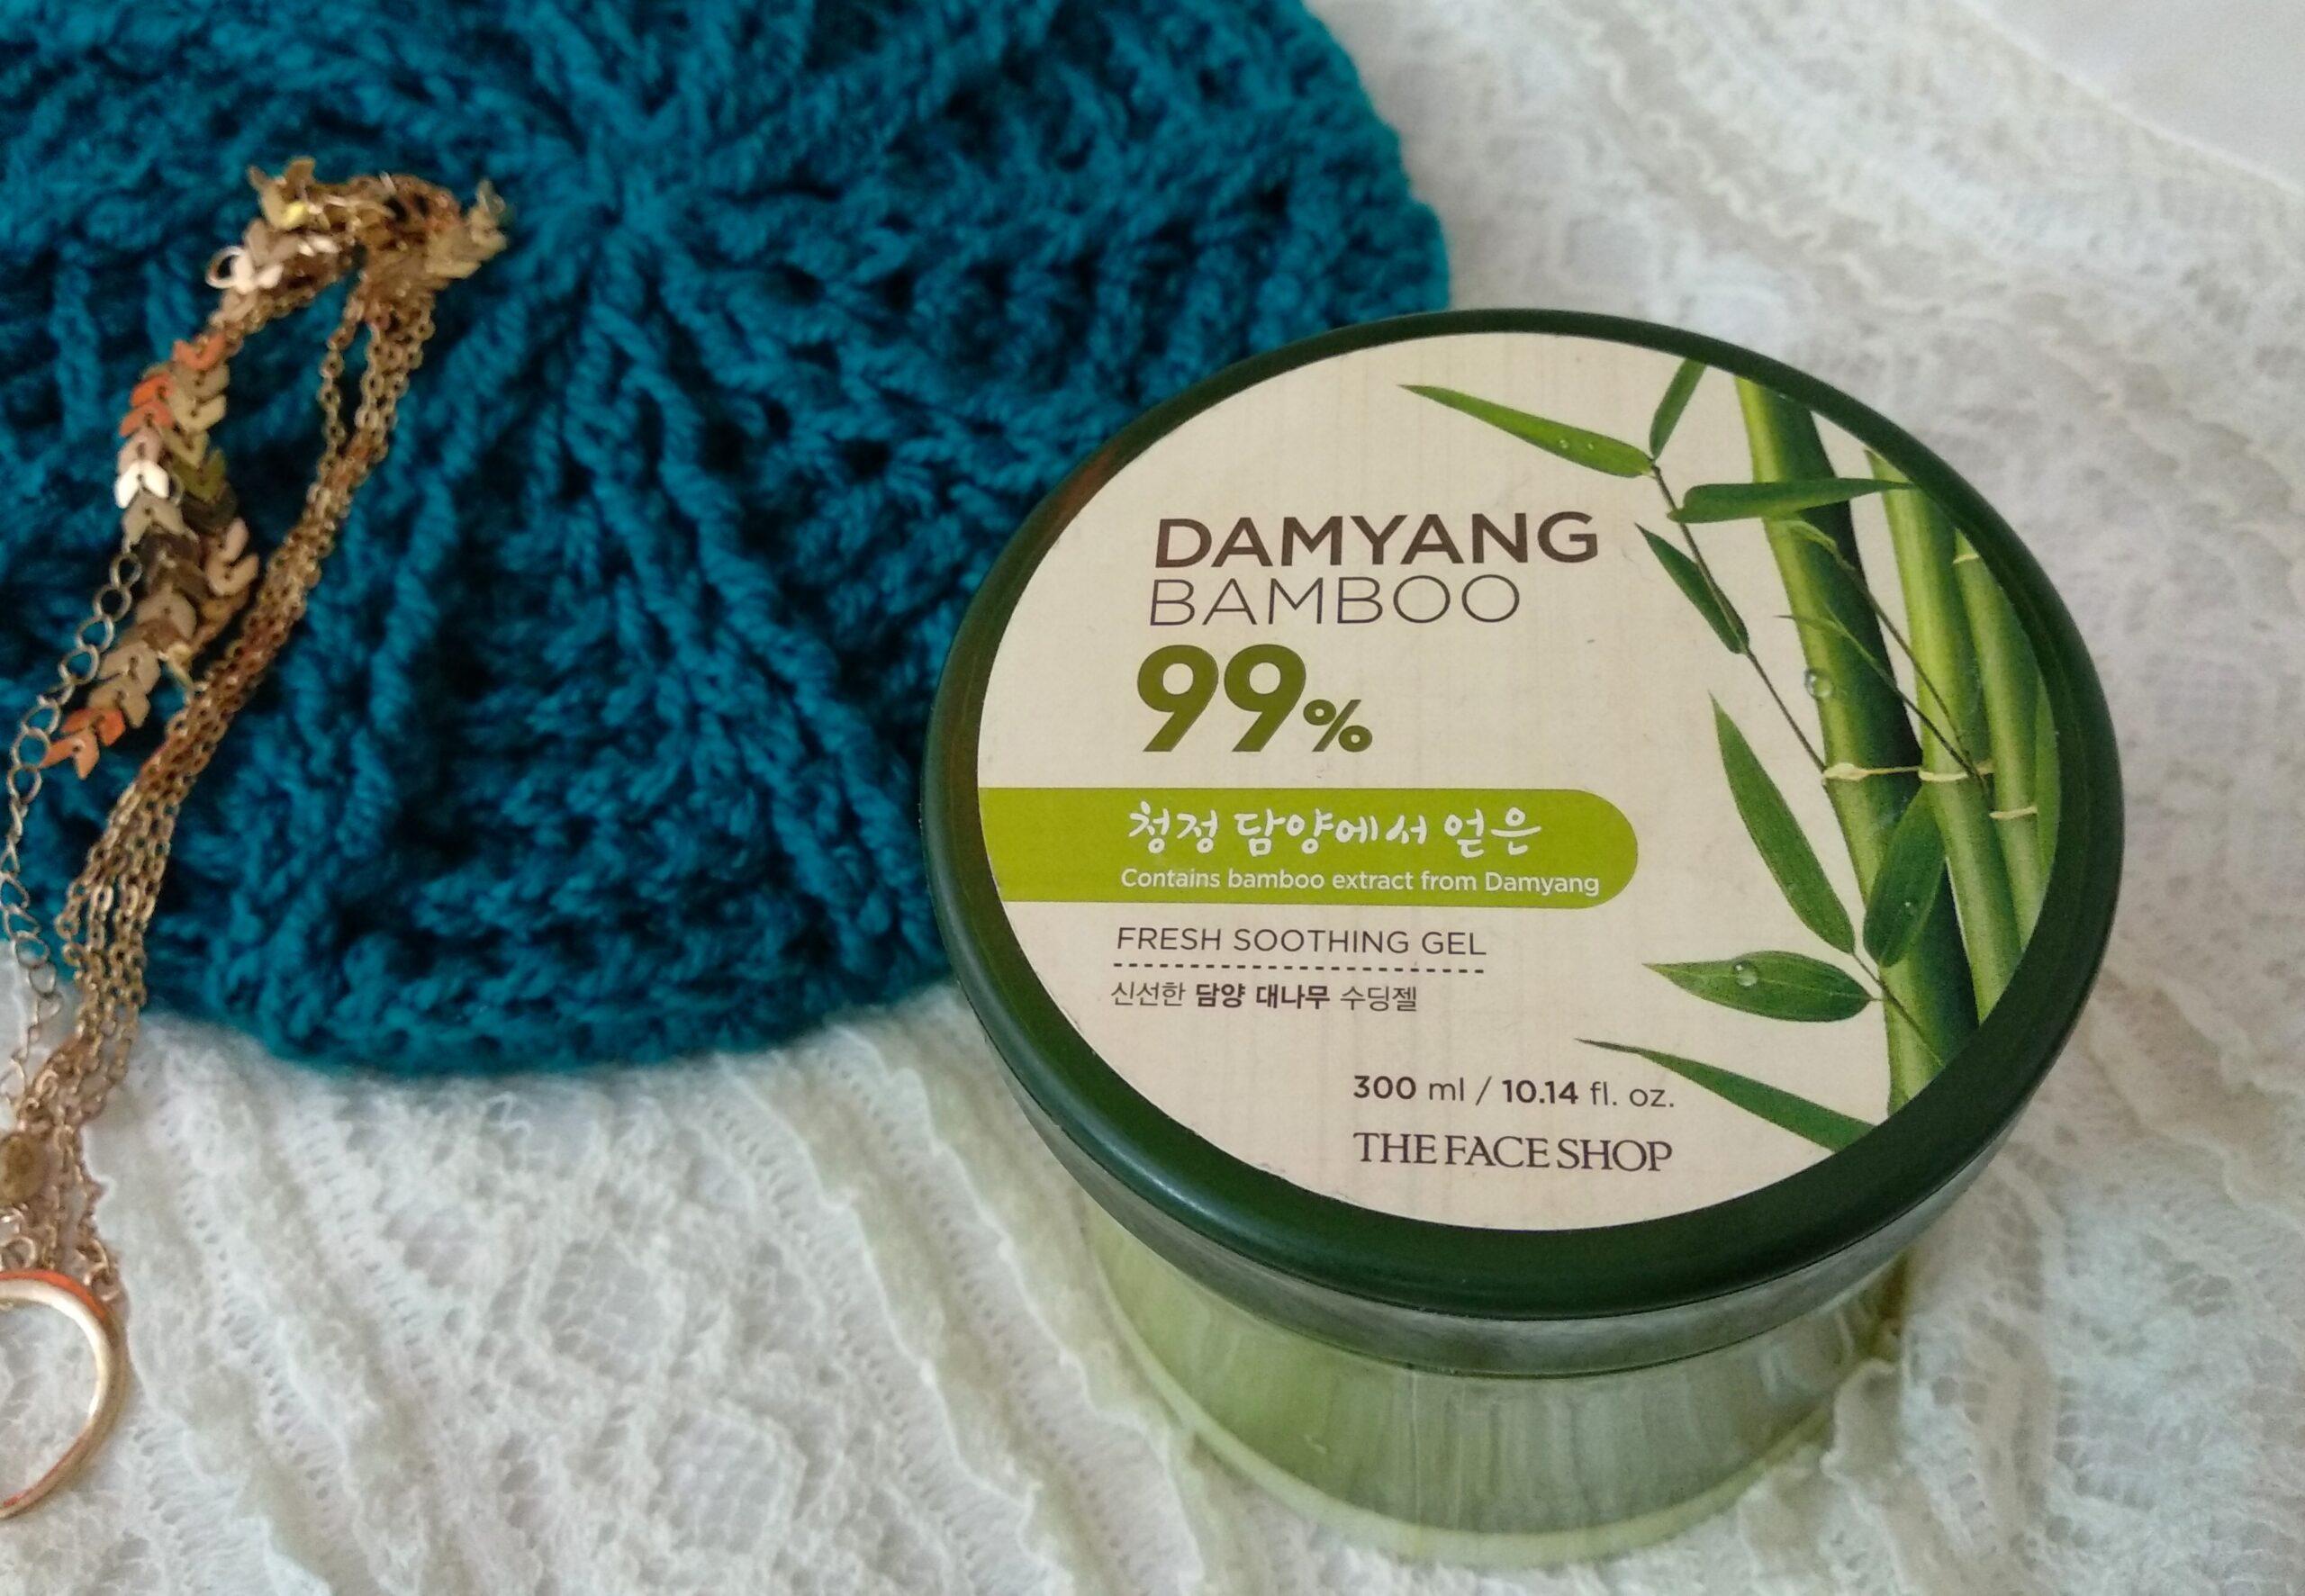 The face shop Damyang bamboo gel review